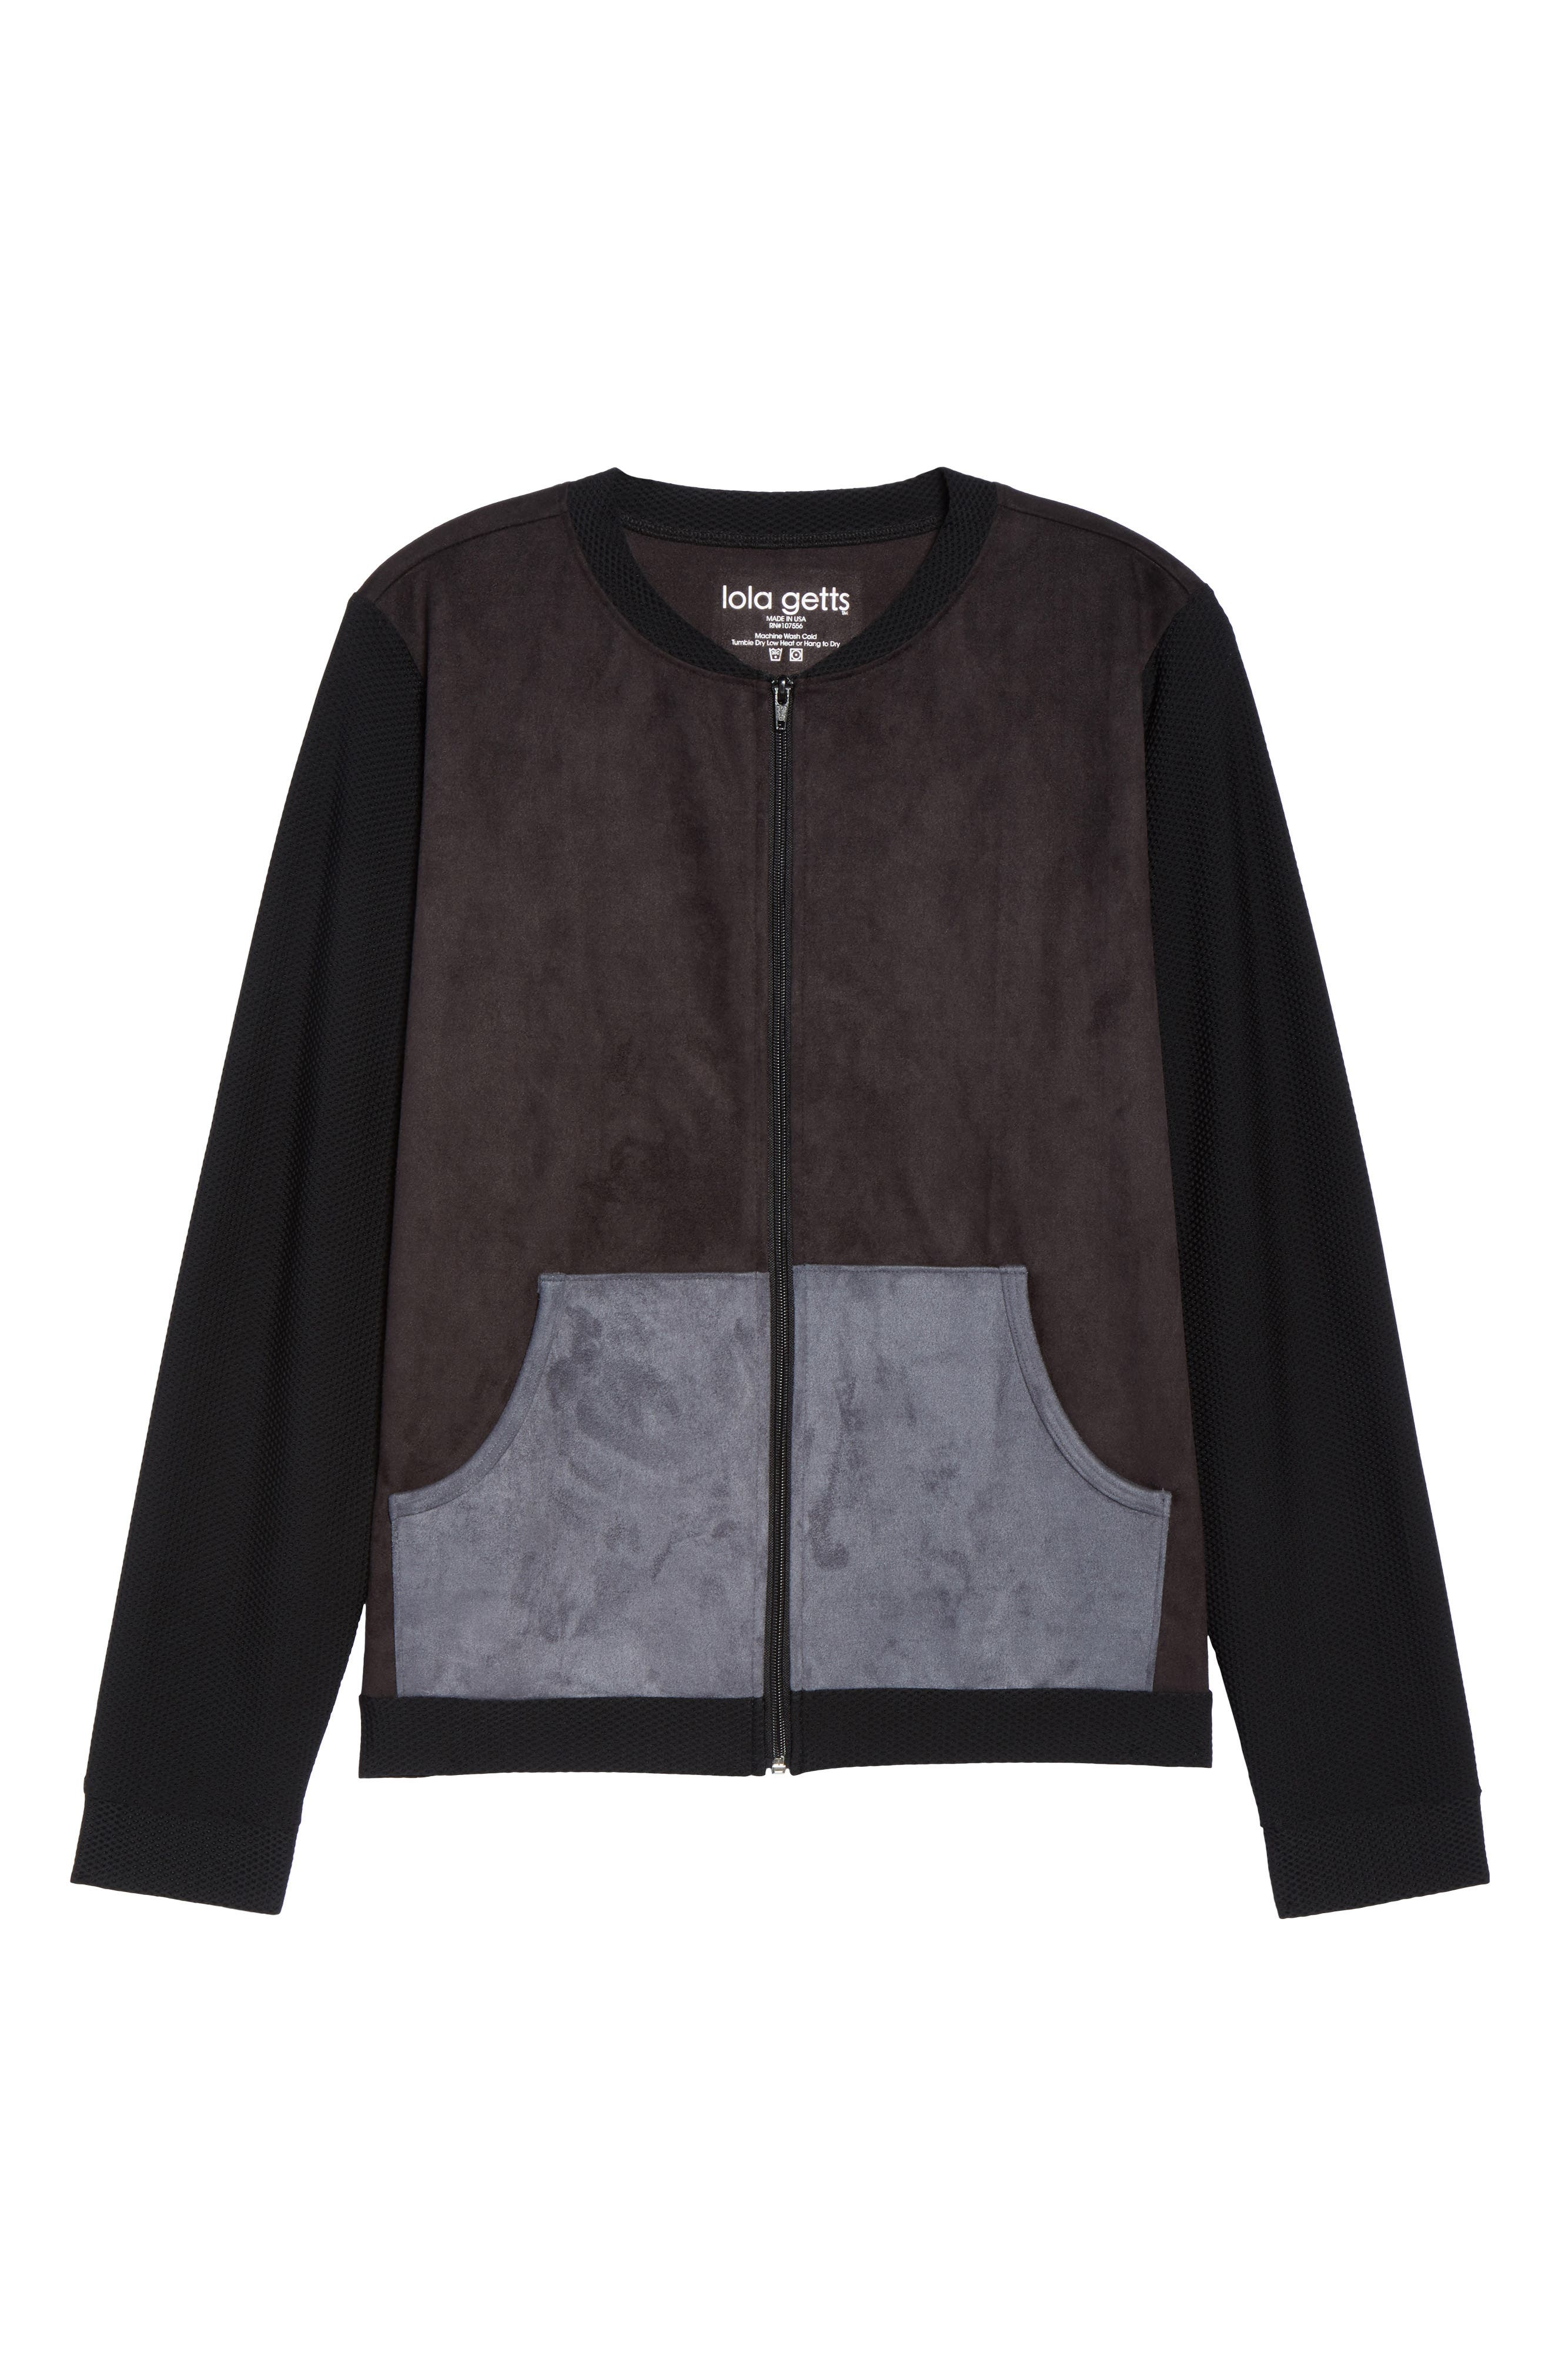 Track Jacket,                             Alternate thumbnail 7, color,                             Black/ Charcoal